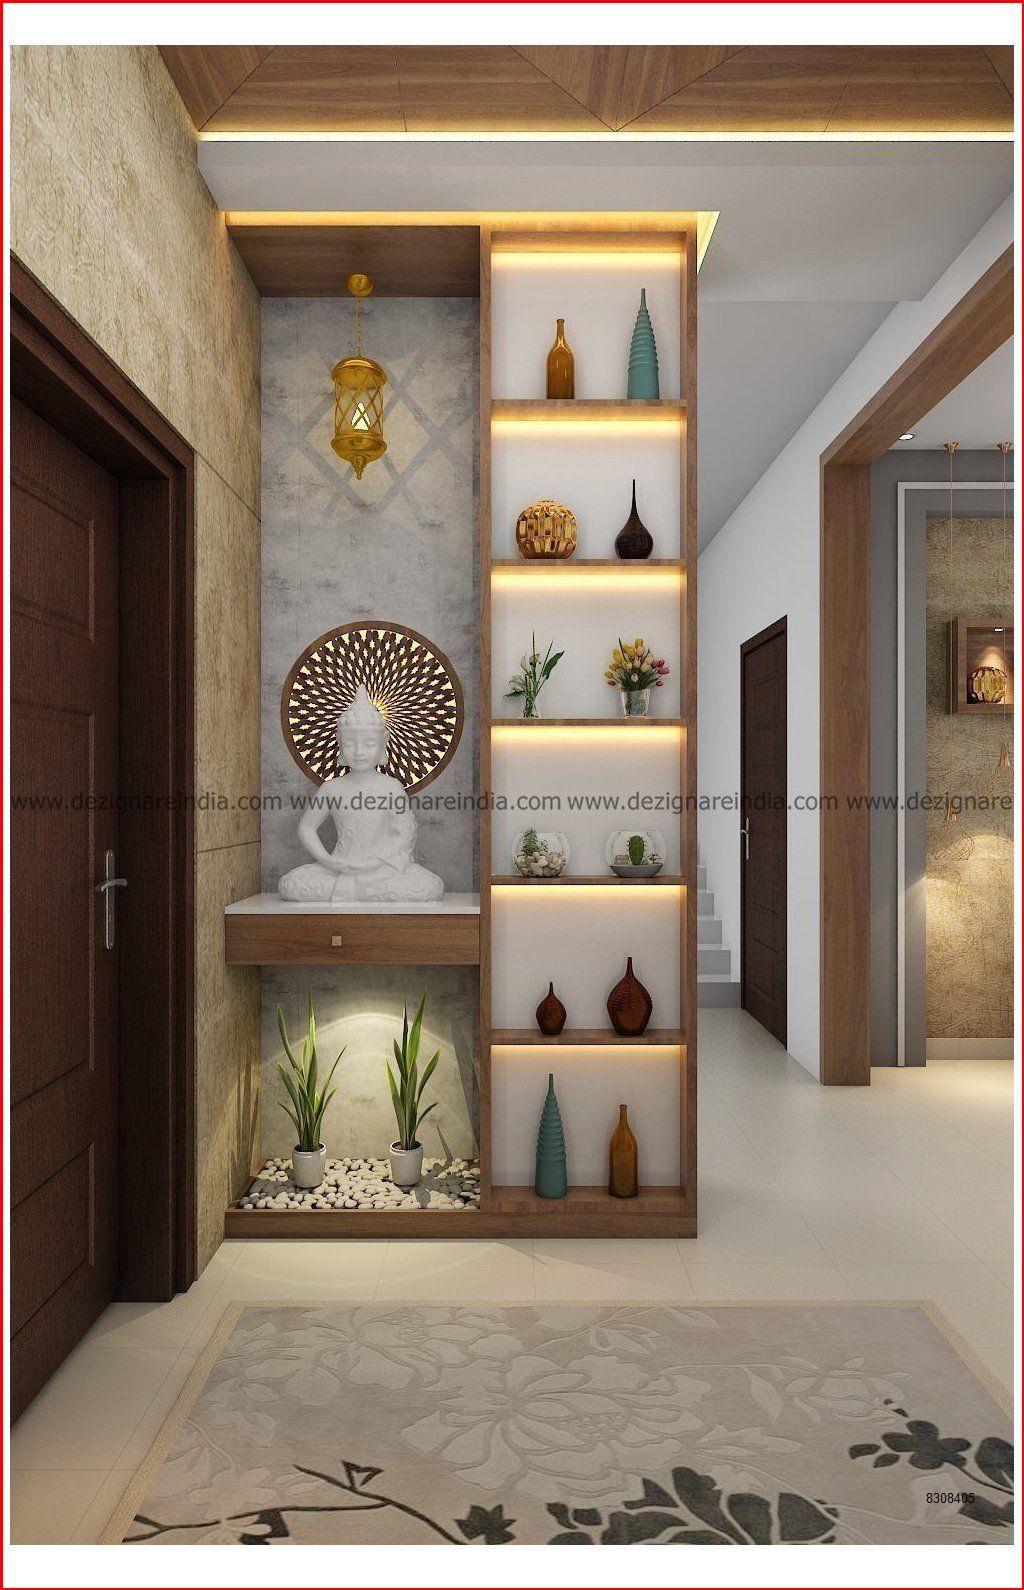 Indian Home Decor Living Room Interior Design Outdoor Decor Diy Kids Decor Chambre Living Room Partition Design House Interior Decor Room Door Design